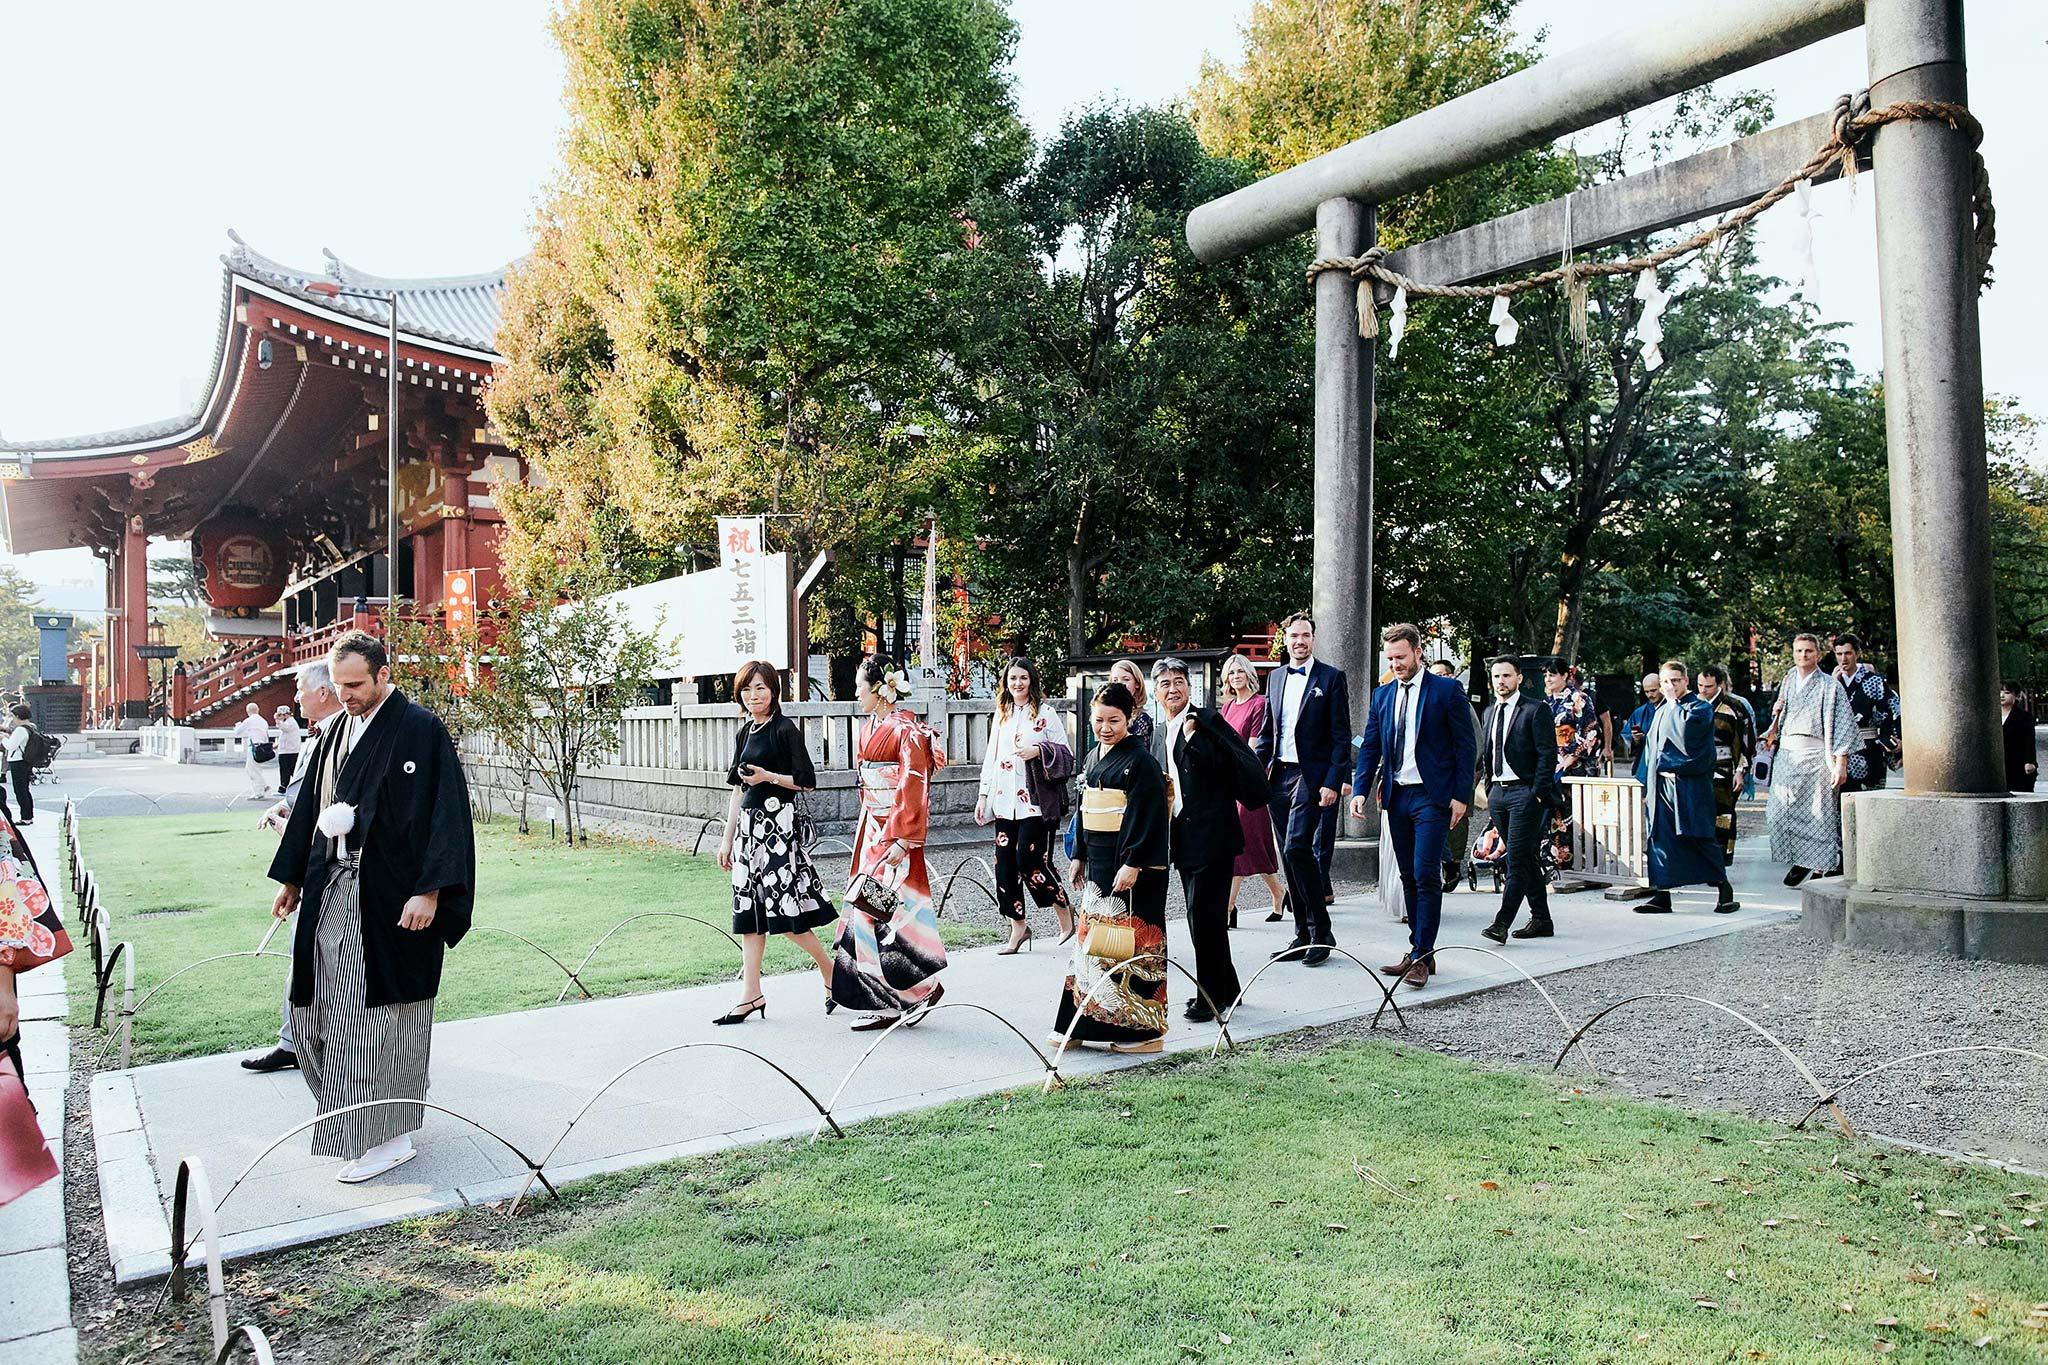 tokyo asakusa shrine traditional wedding leaving ceremony